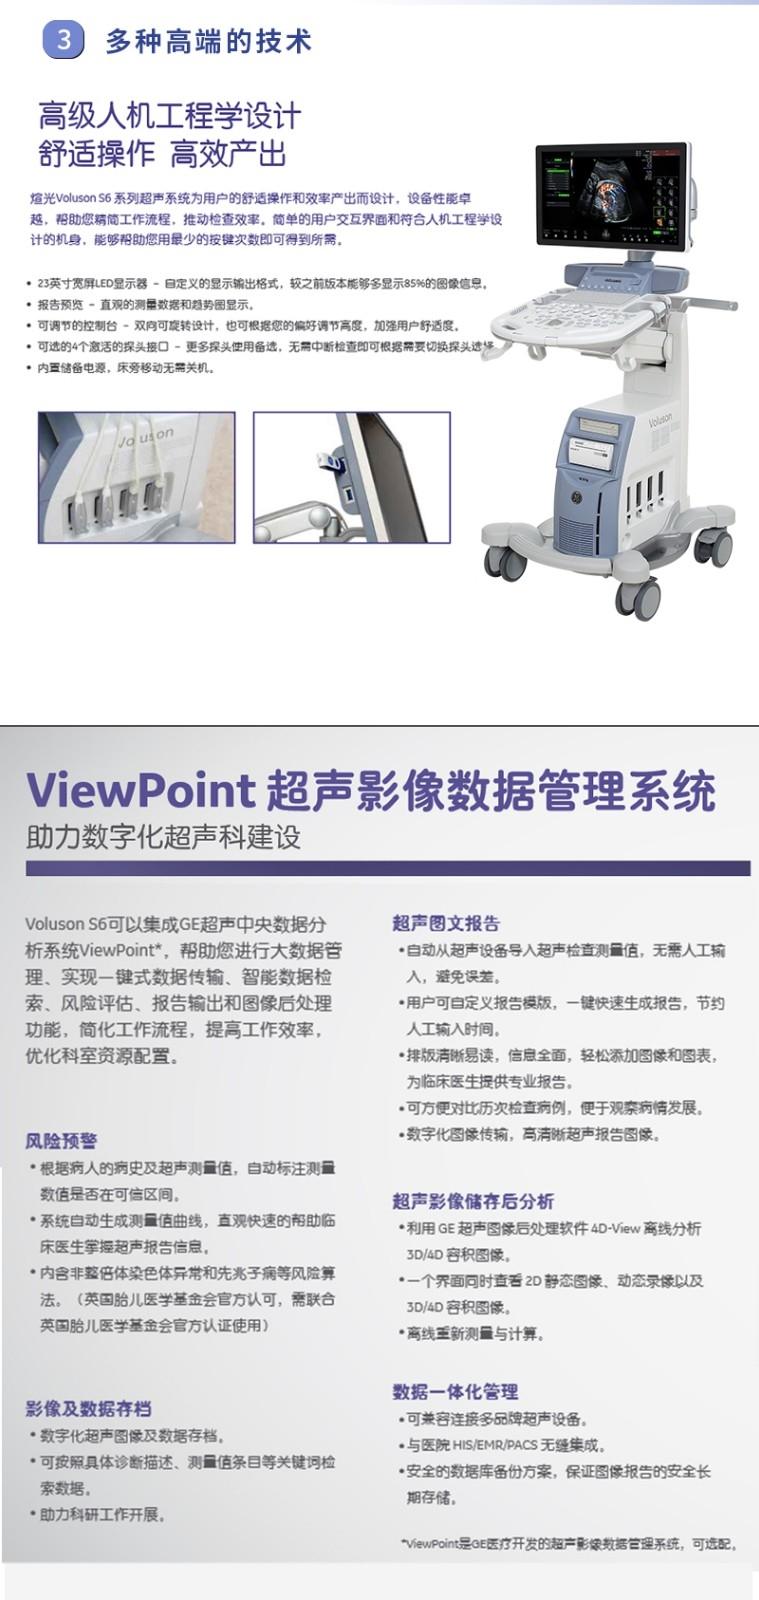 GE医疗 彩色多普勒超声诊断仪